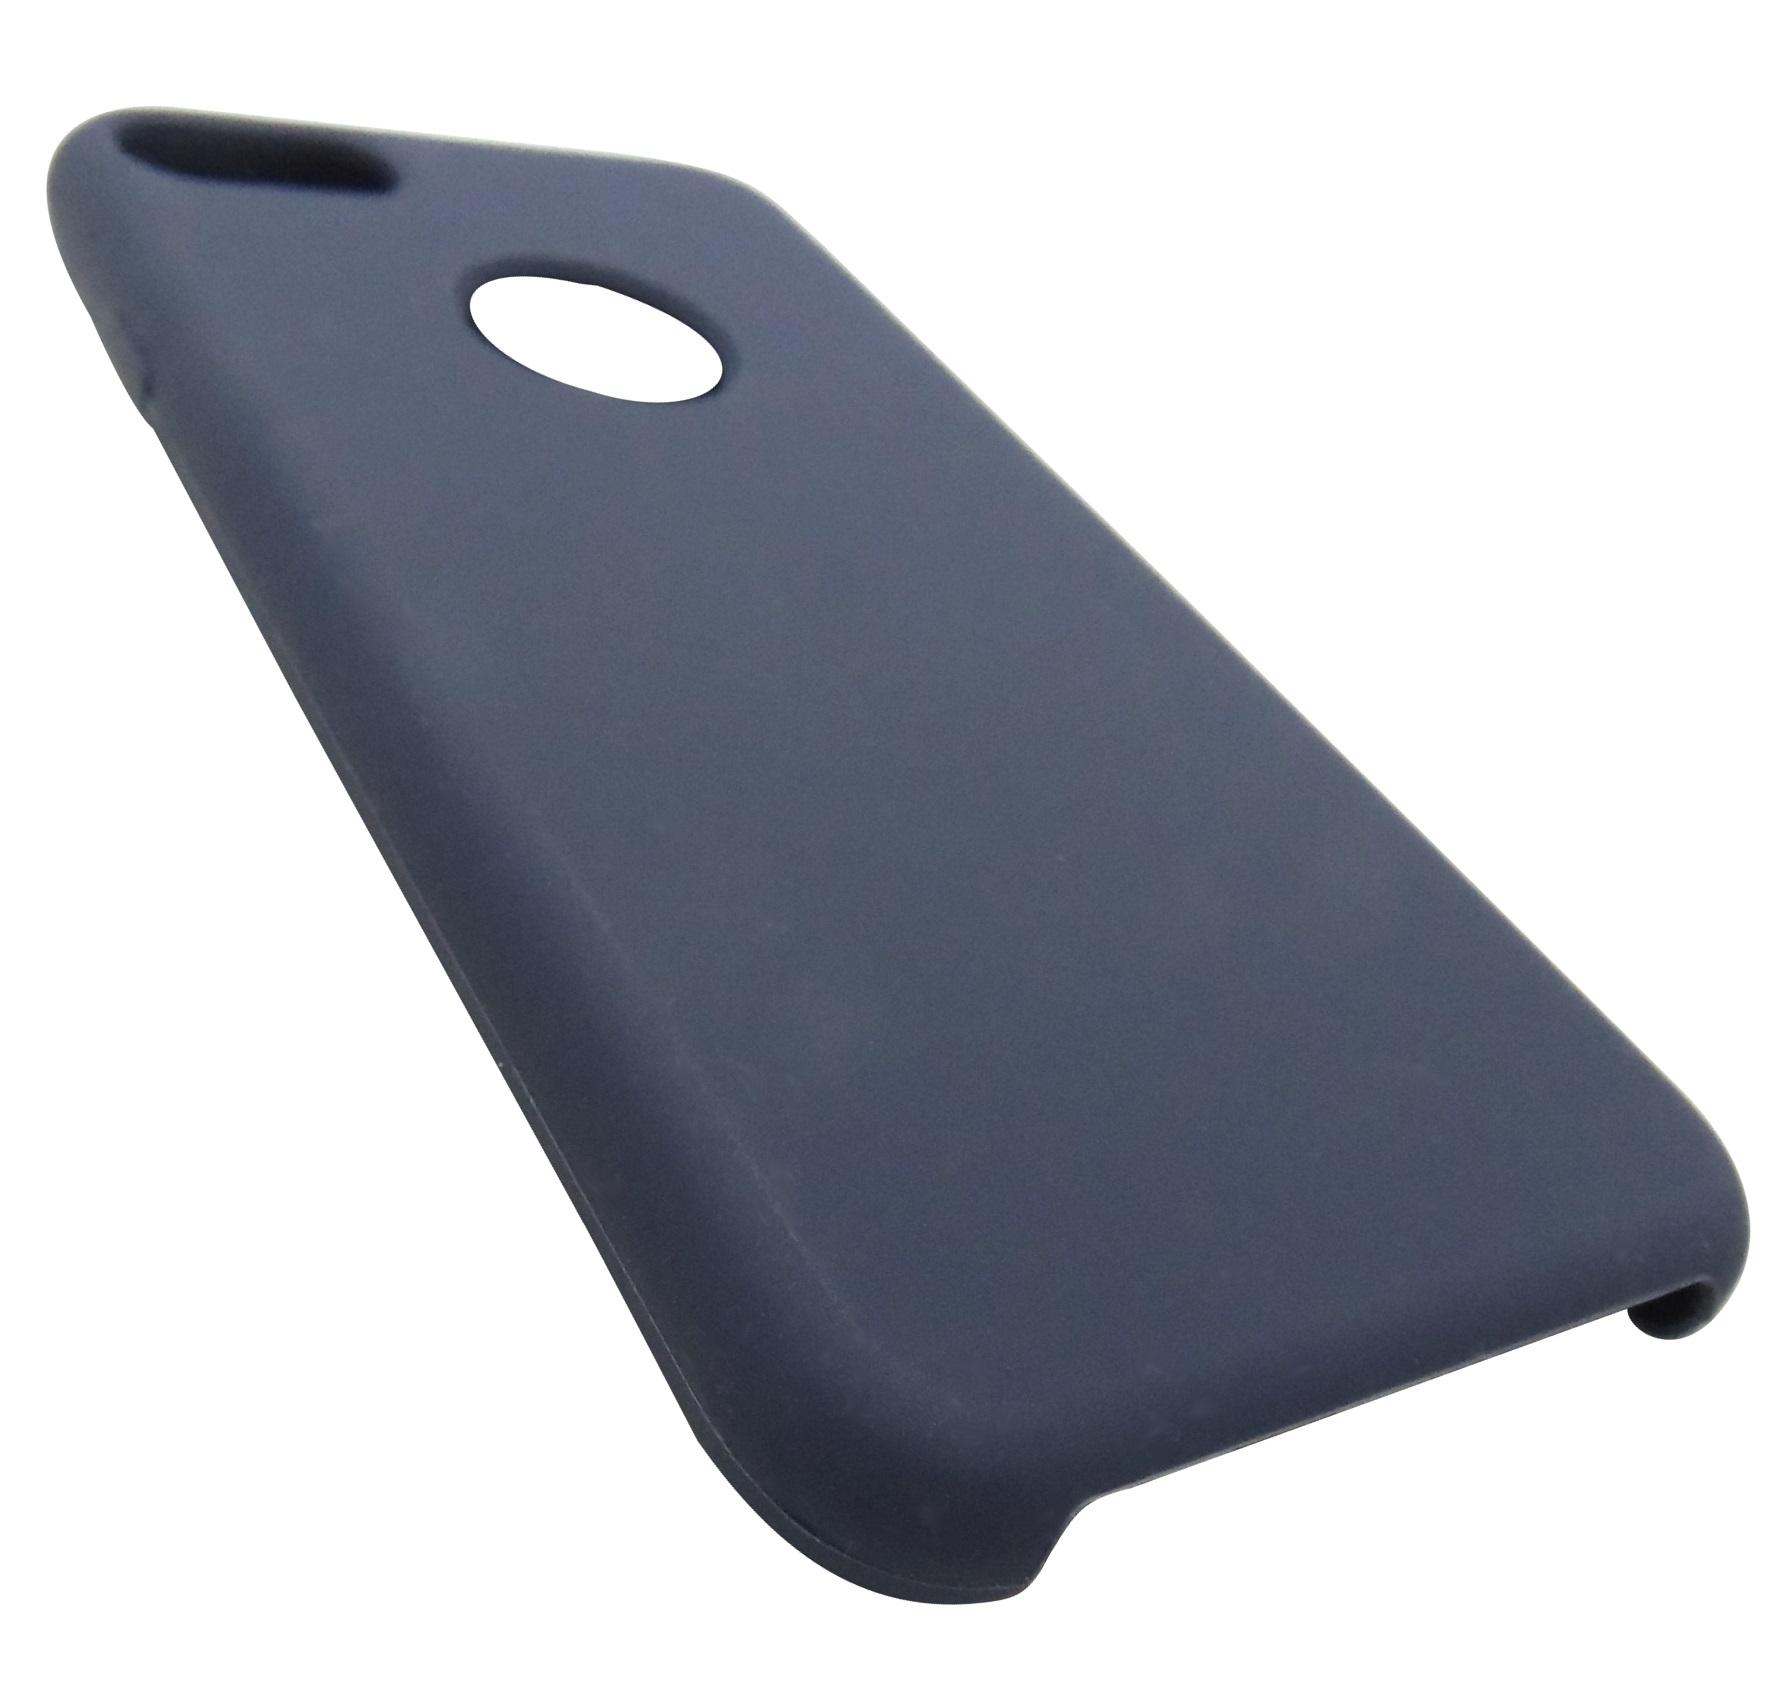 Husa silicon TPU Matte (anti-amprenta, anti-alunecare) bleumarin pentru Apple iPhone 7/8